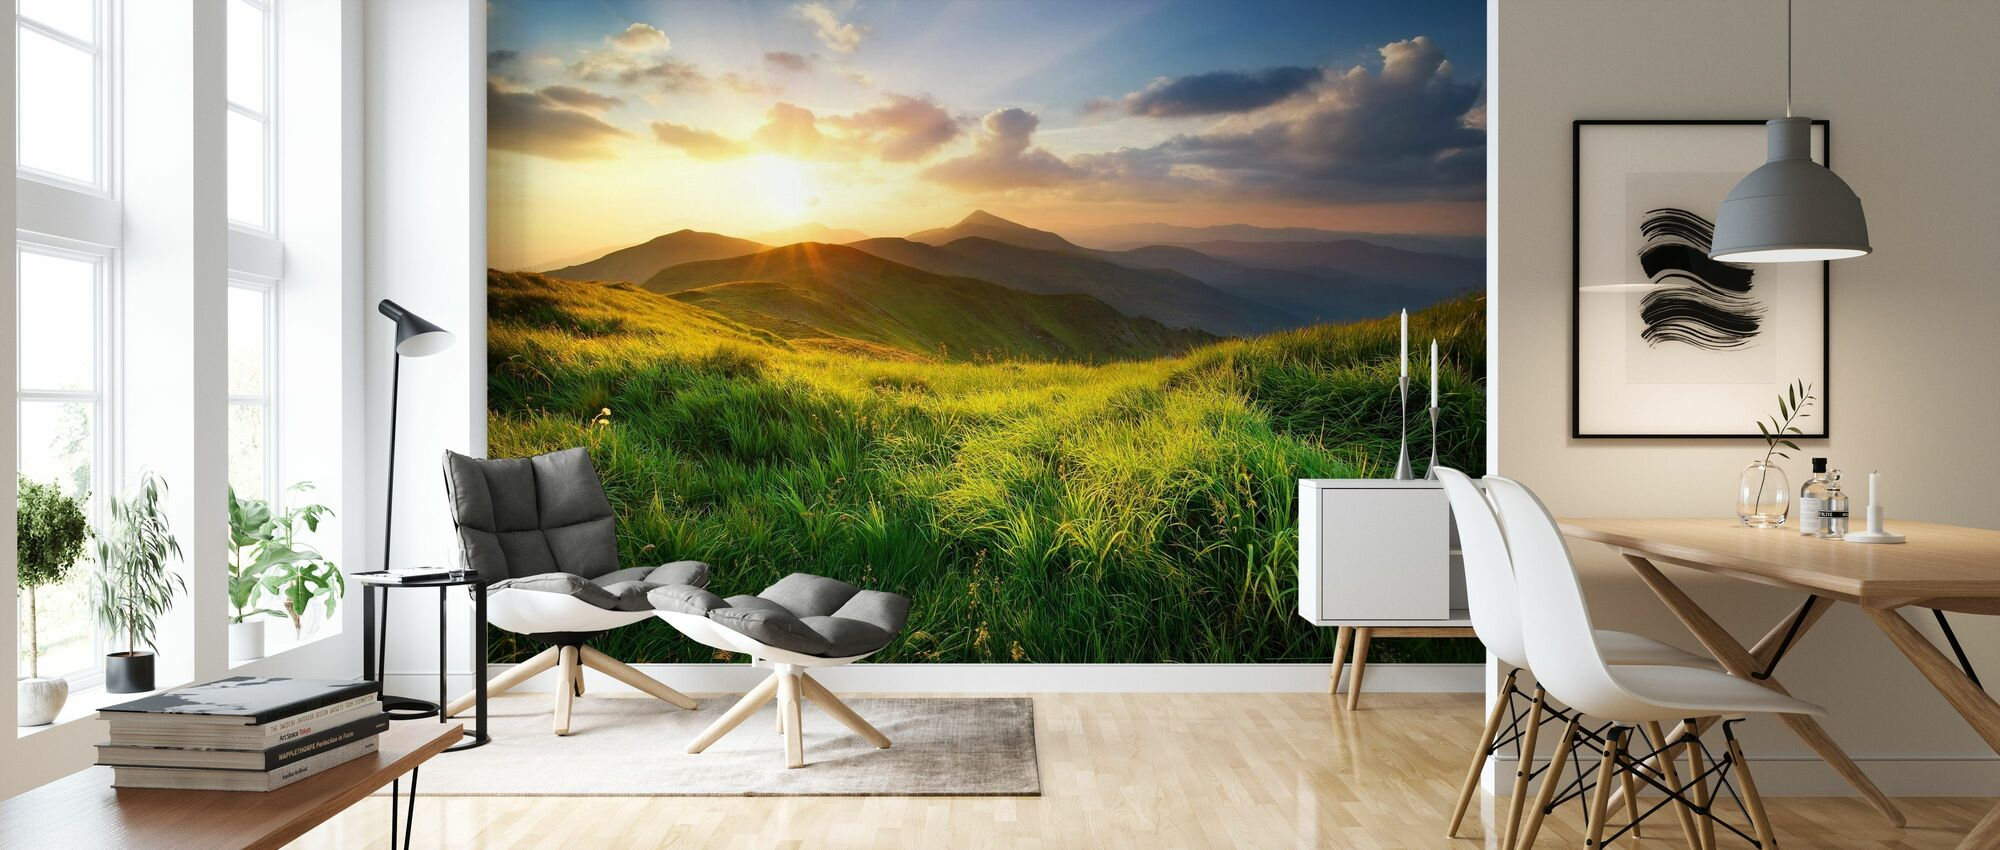 Dramatic Landscape - Wallpaper - Living Room